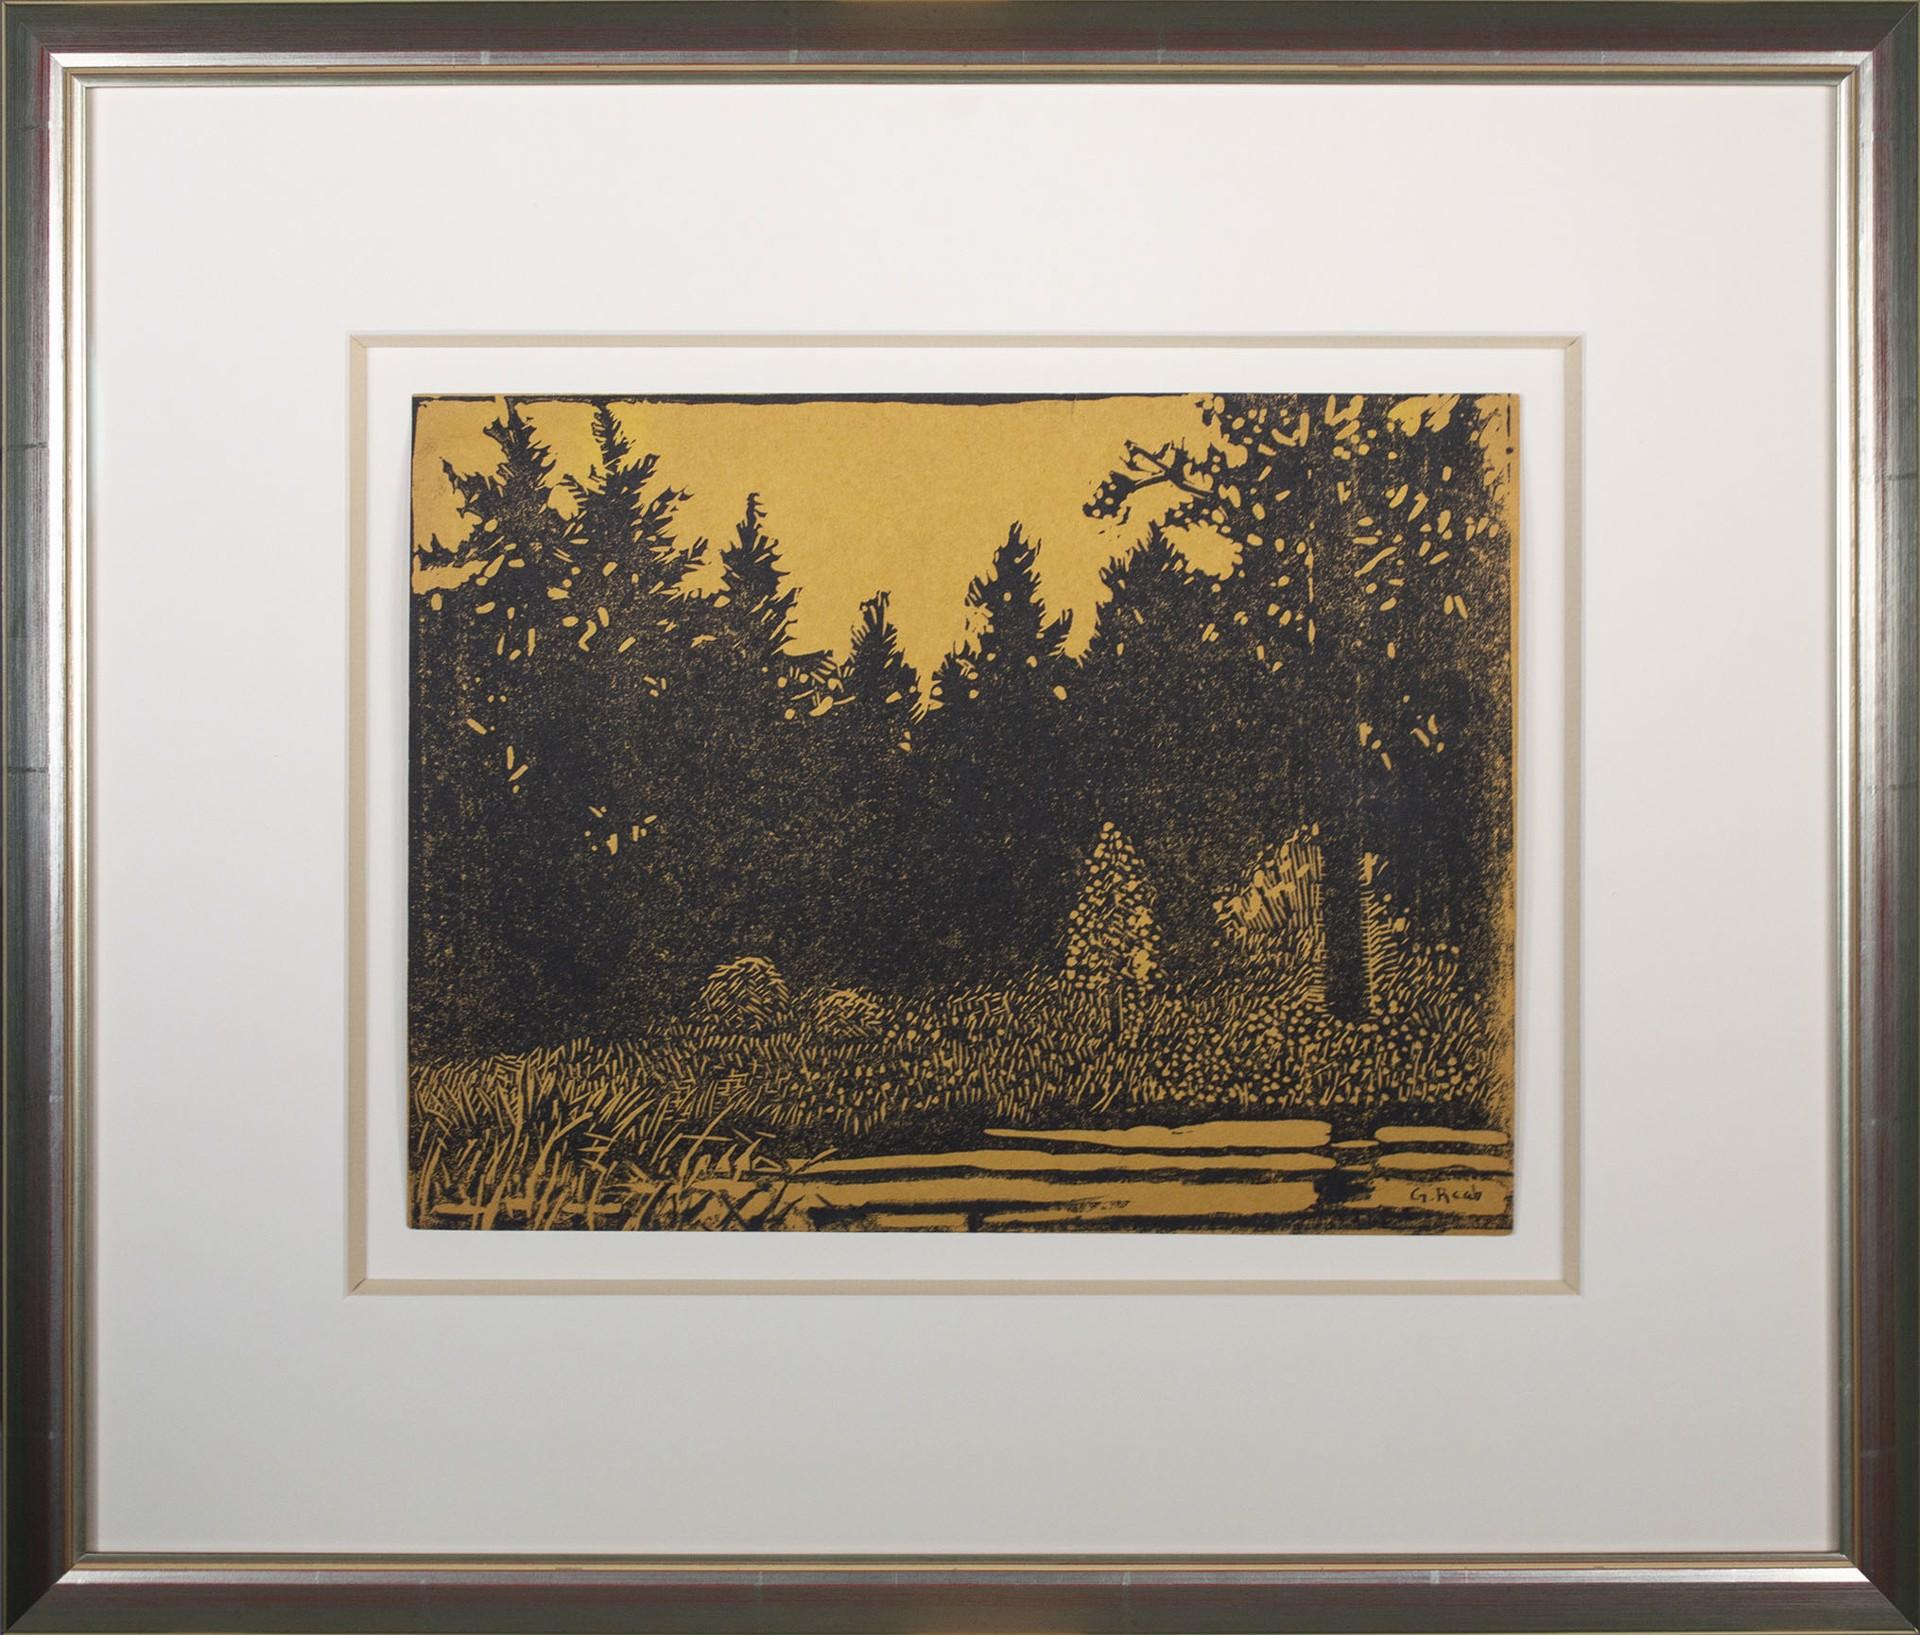 Forest Primeval by George Raab